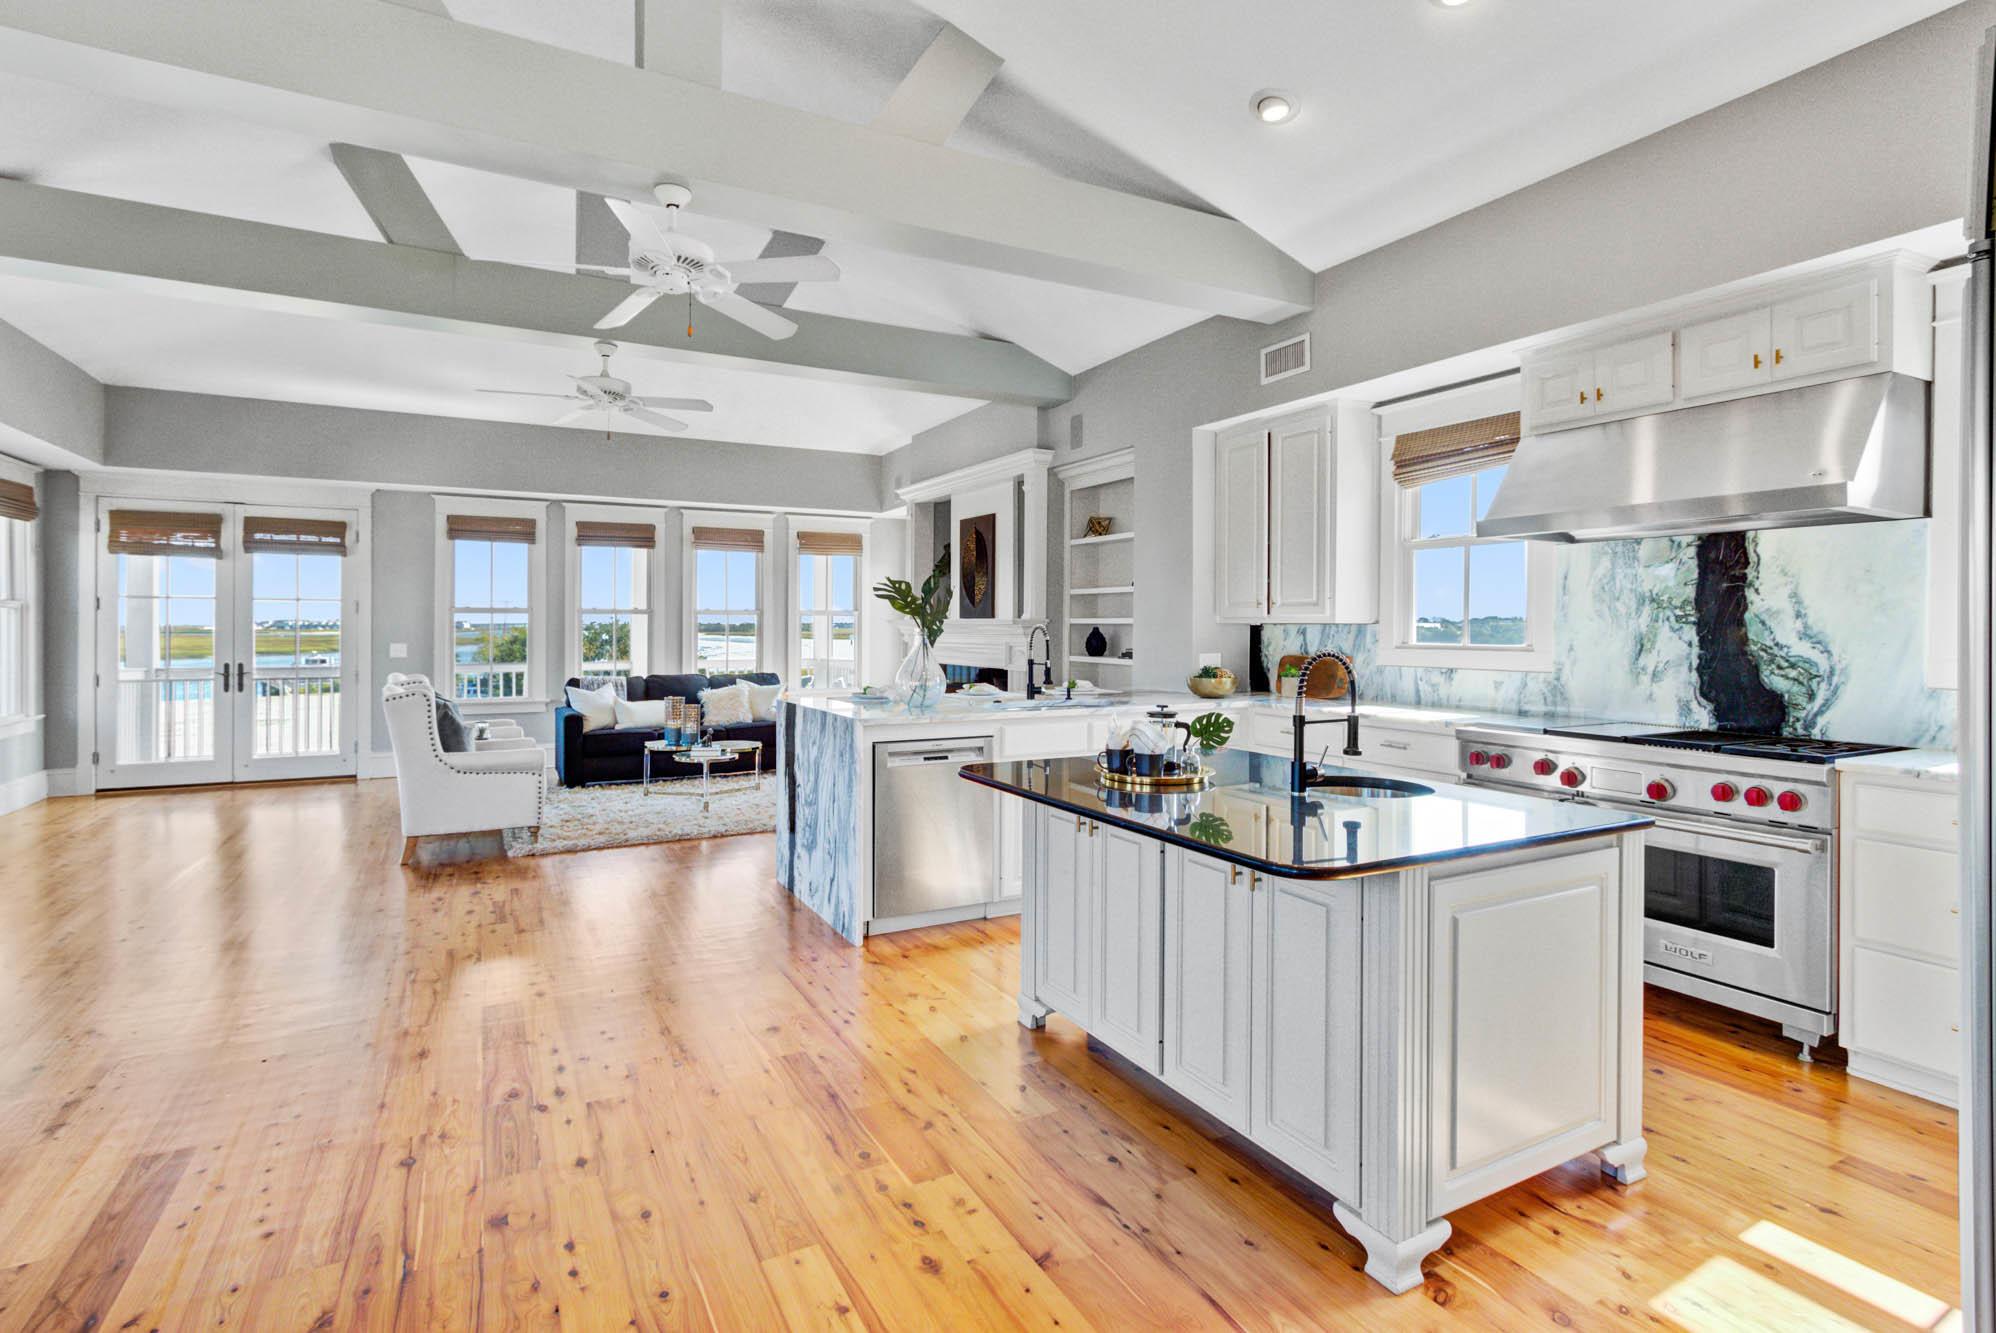 Sullivans Island Homes For Sale - 904 Middle, Sullivans Island, SC - 35